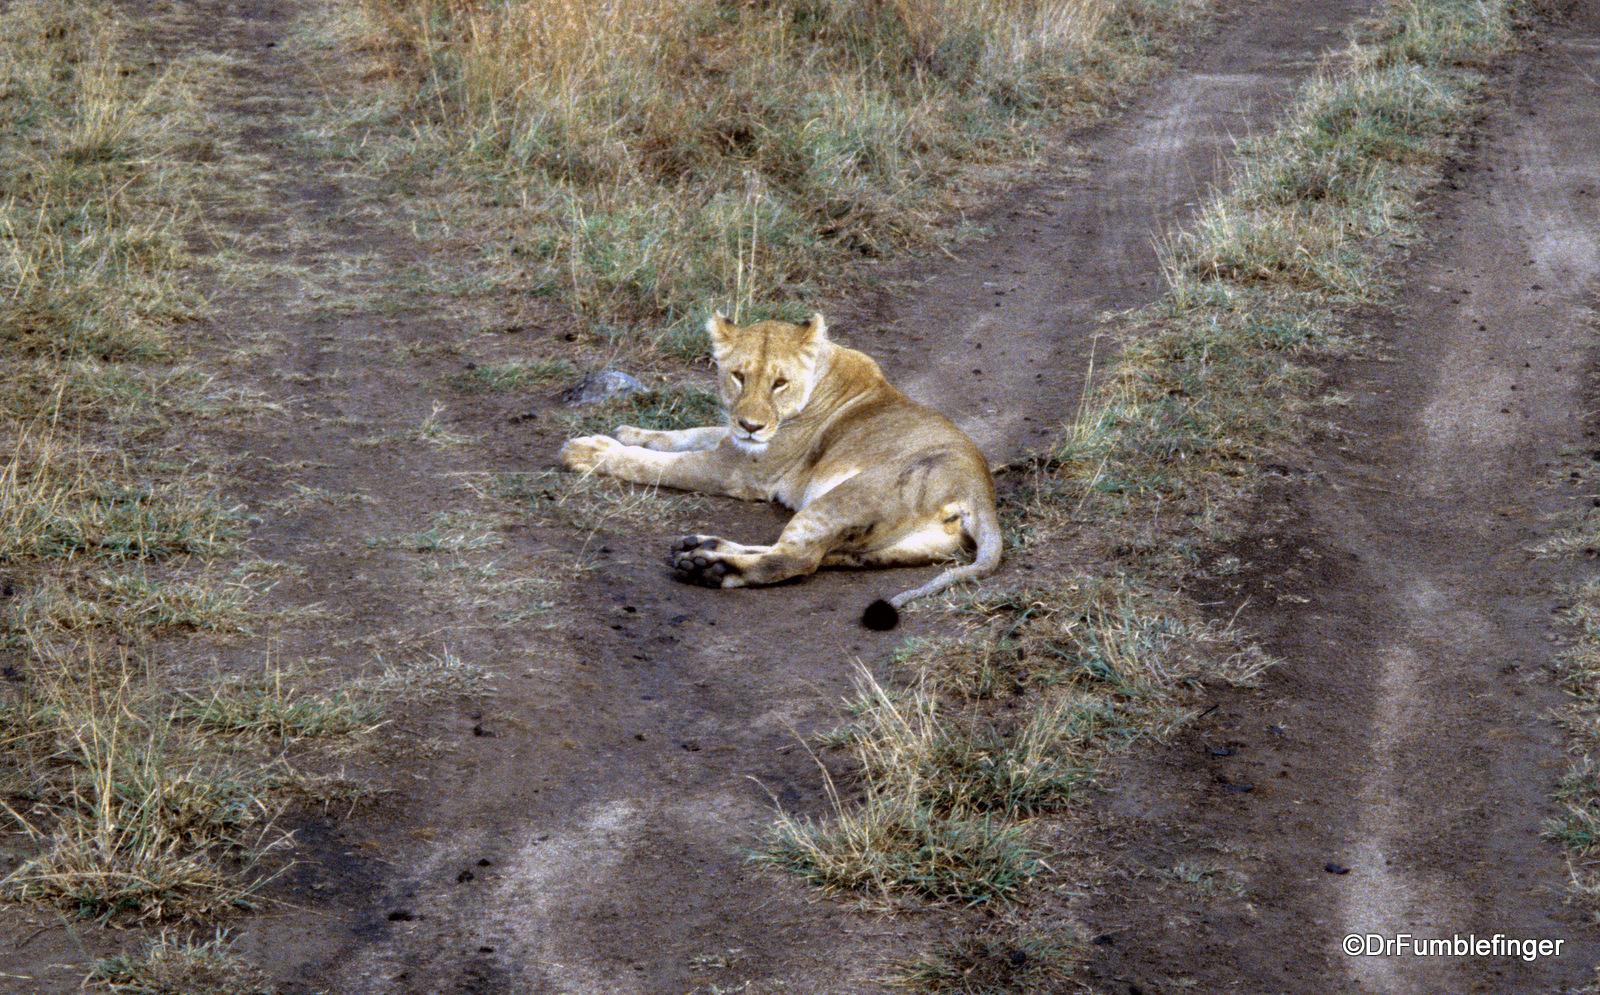 Lioness blocking road, Serengeti National Park